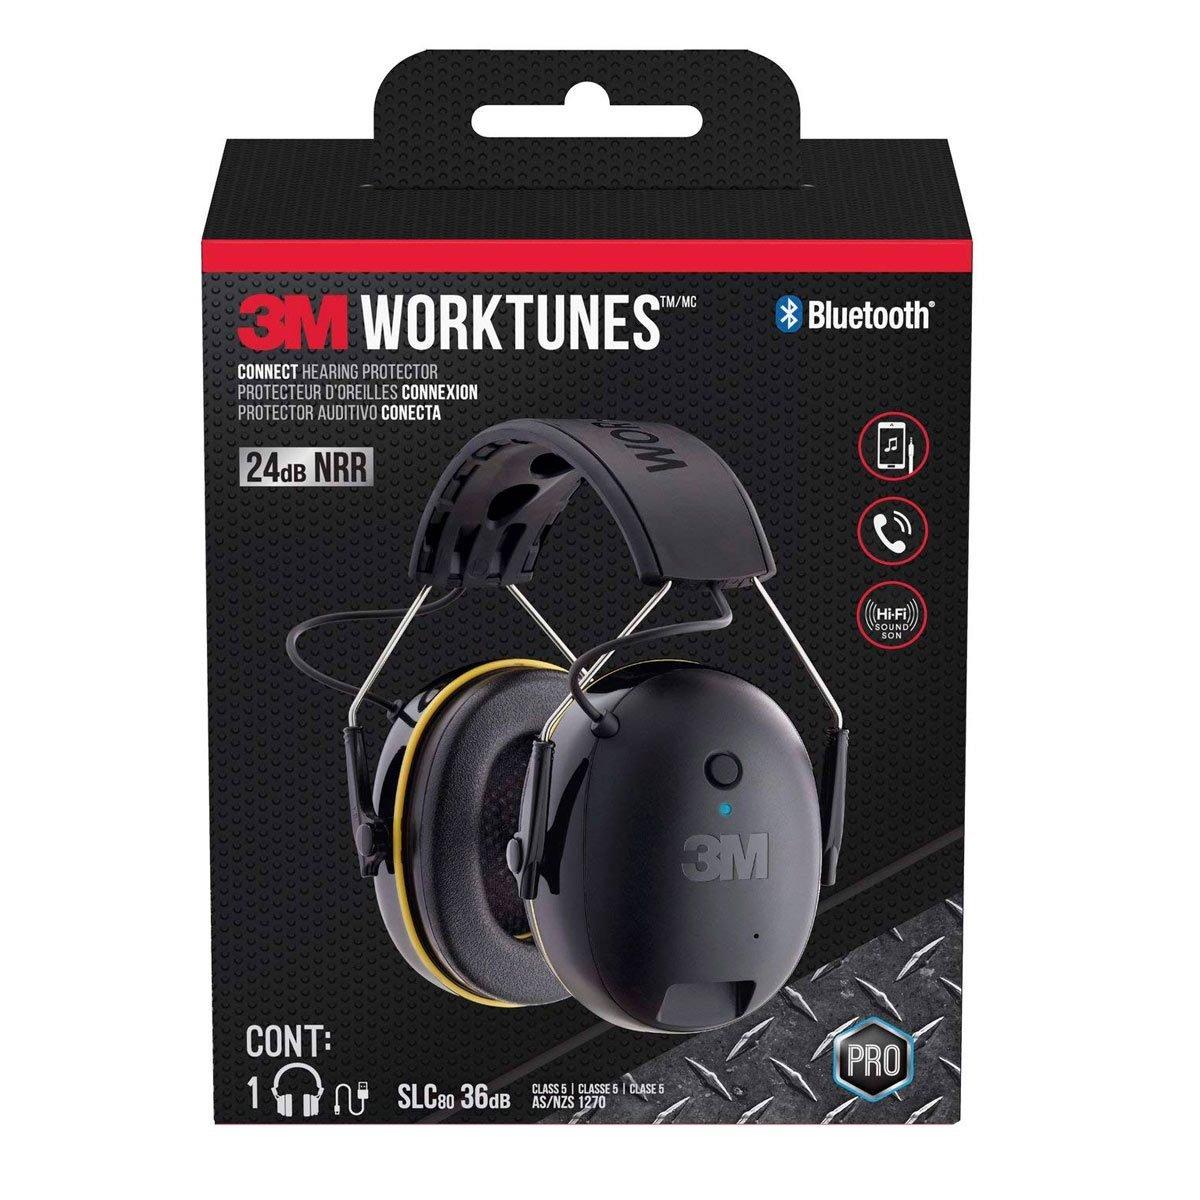 Bluetooth headphones for work